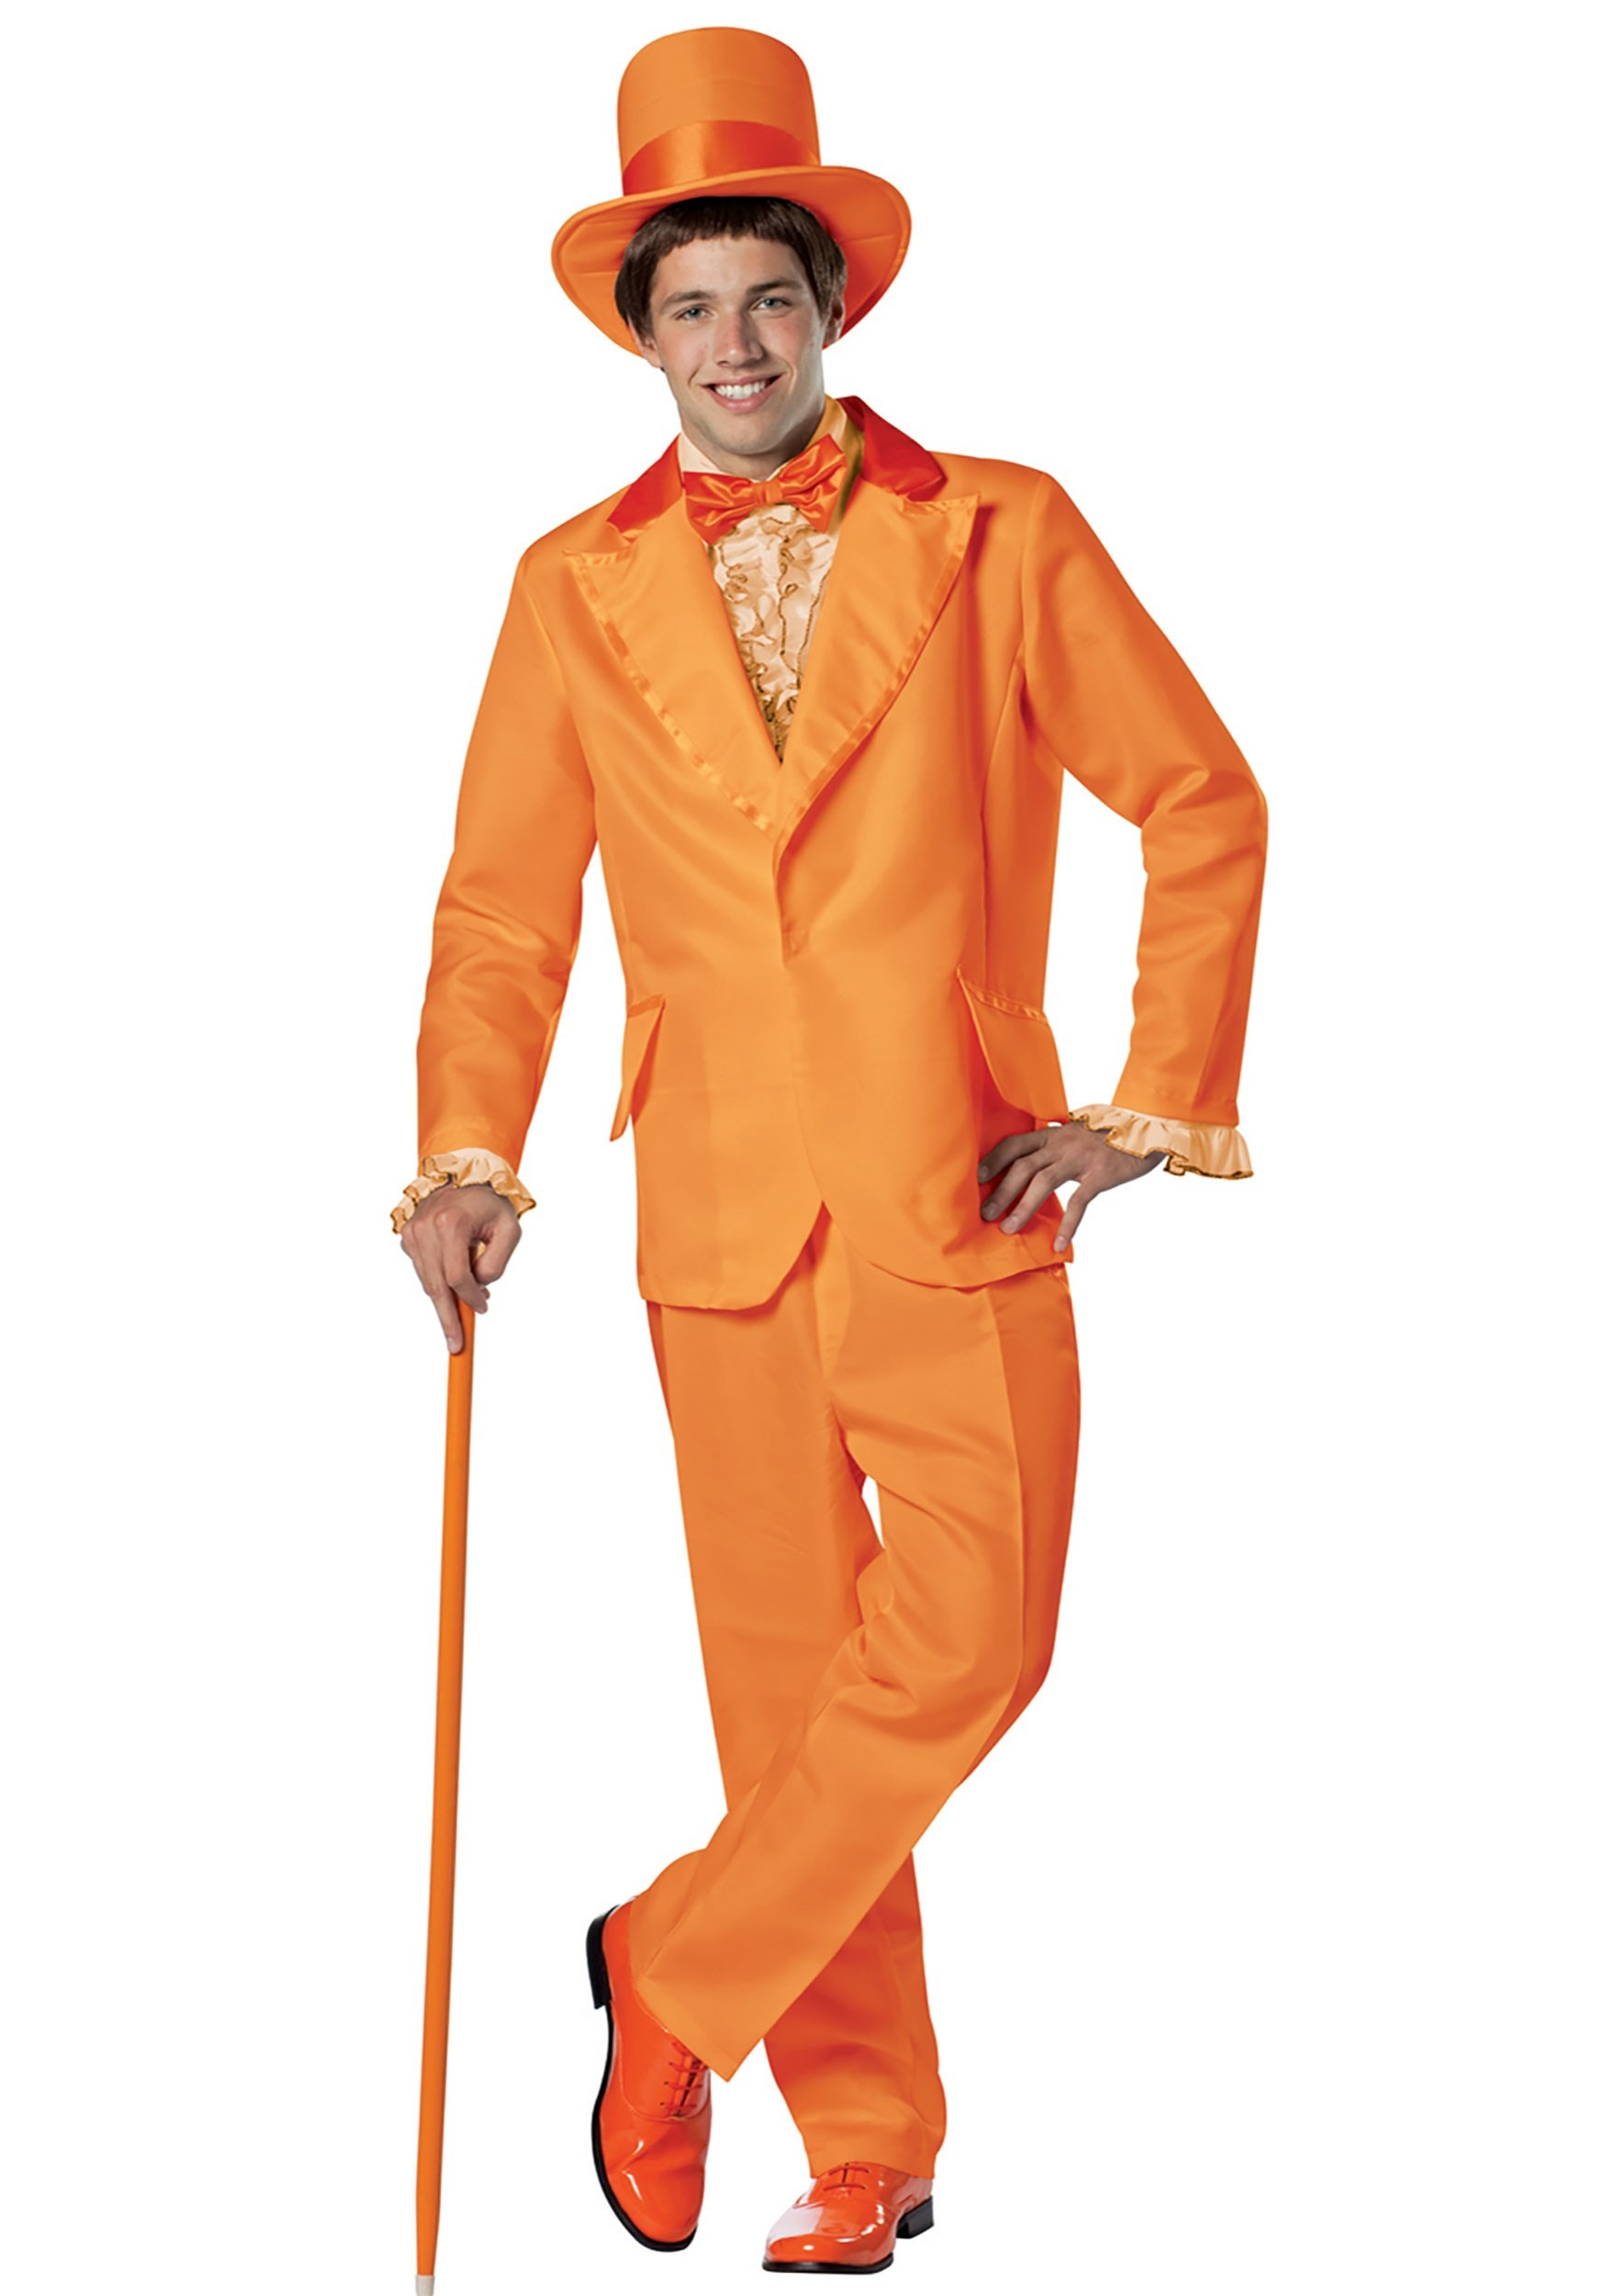 Dumb and Dumber Orange Satin Top Hat Lloyd Christmas Costume Accessory